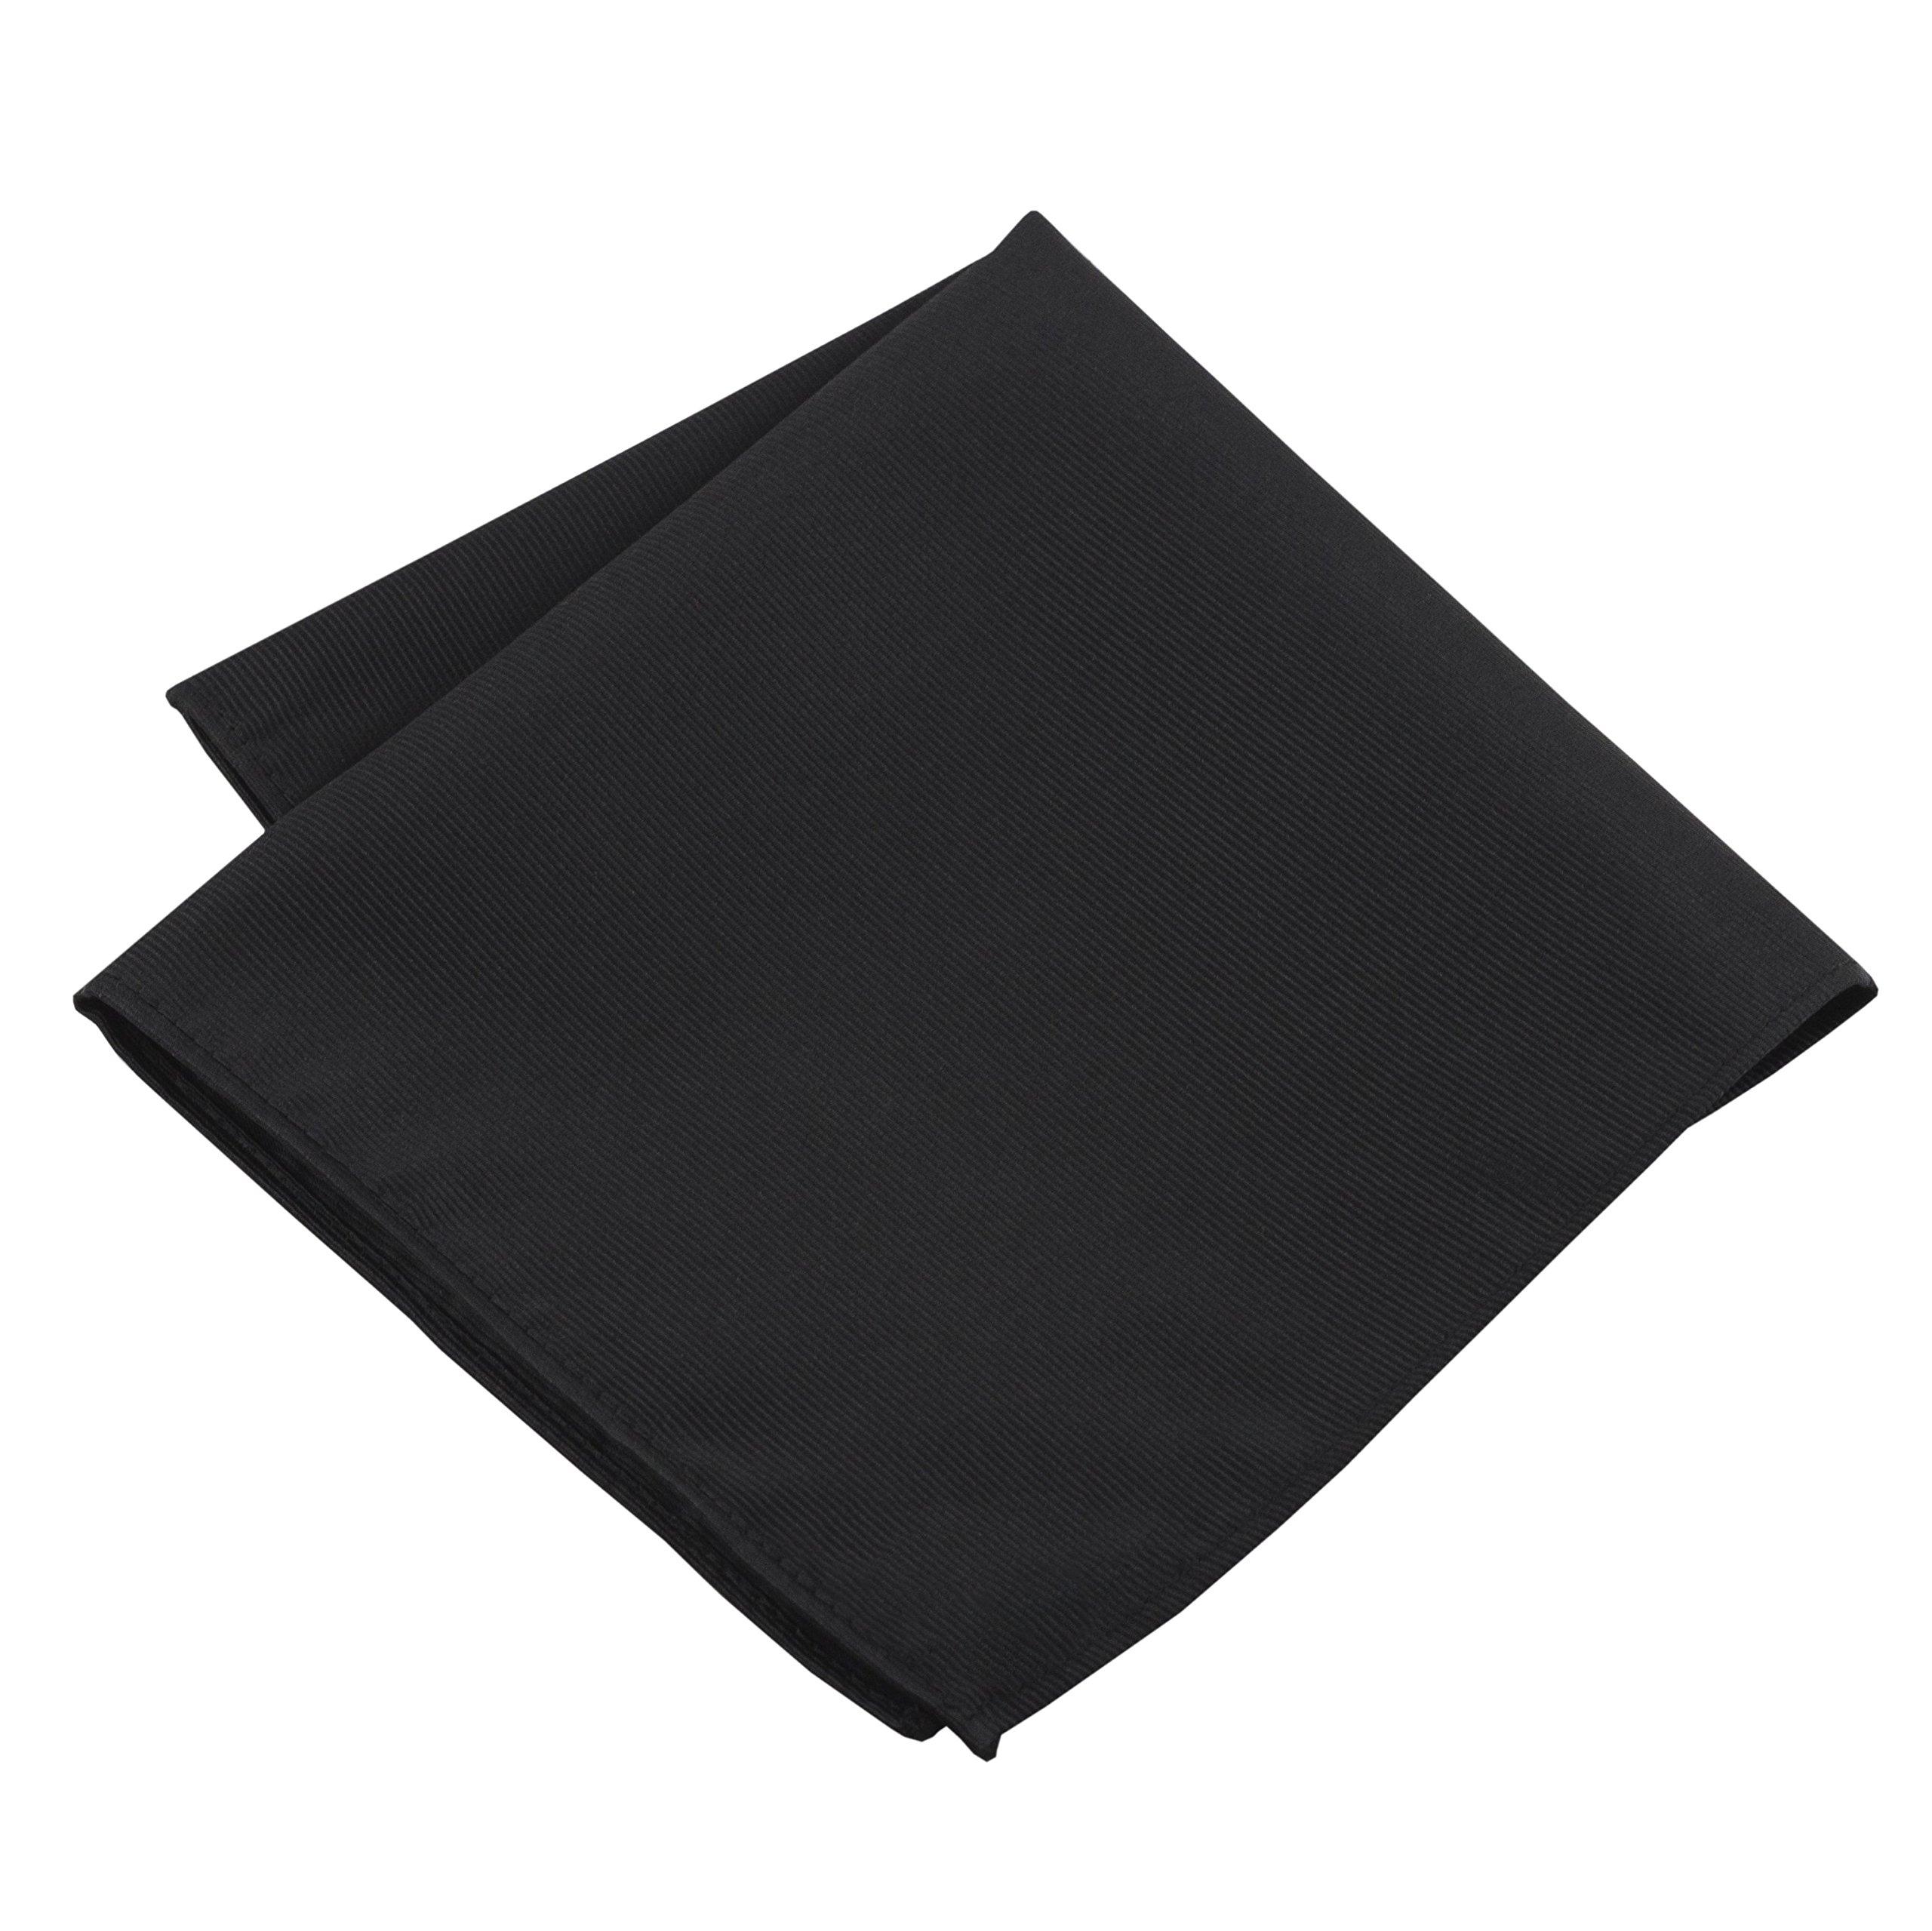 0628c2ce4a2c Get Quotations · 100% Silk Woven Mens Pocket Squares For Men Wedding &  Tuxedo Pocket Square by John